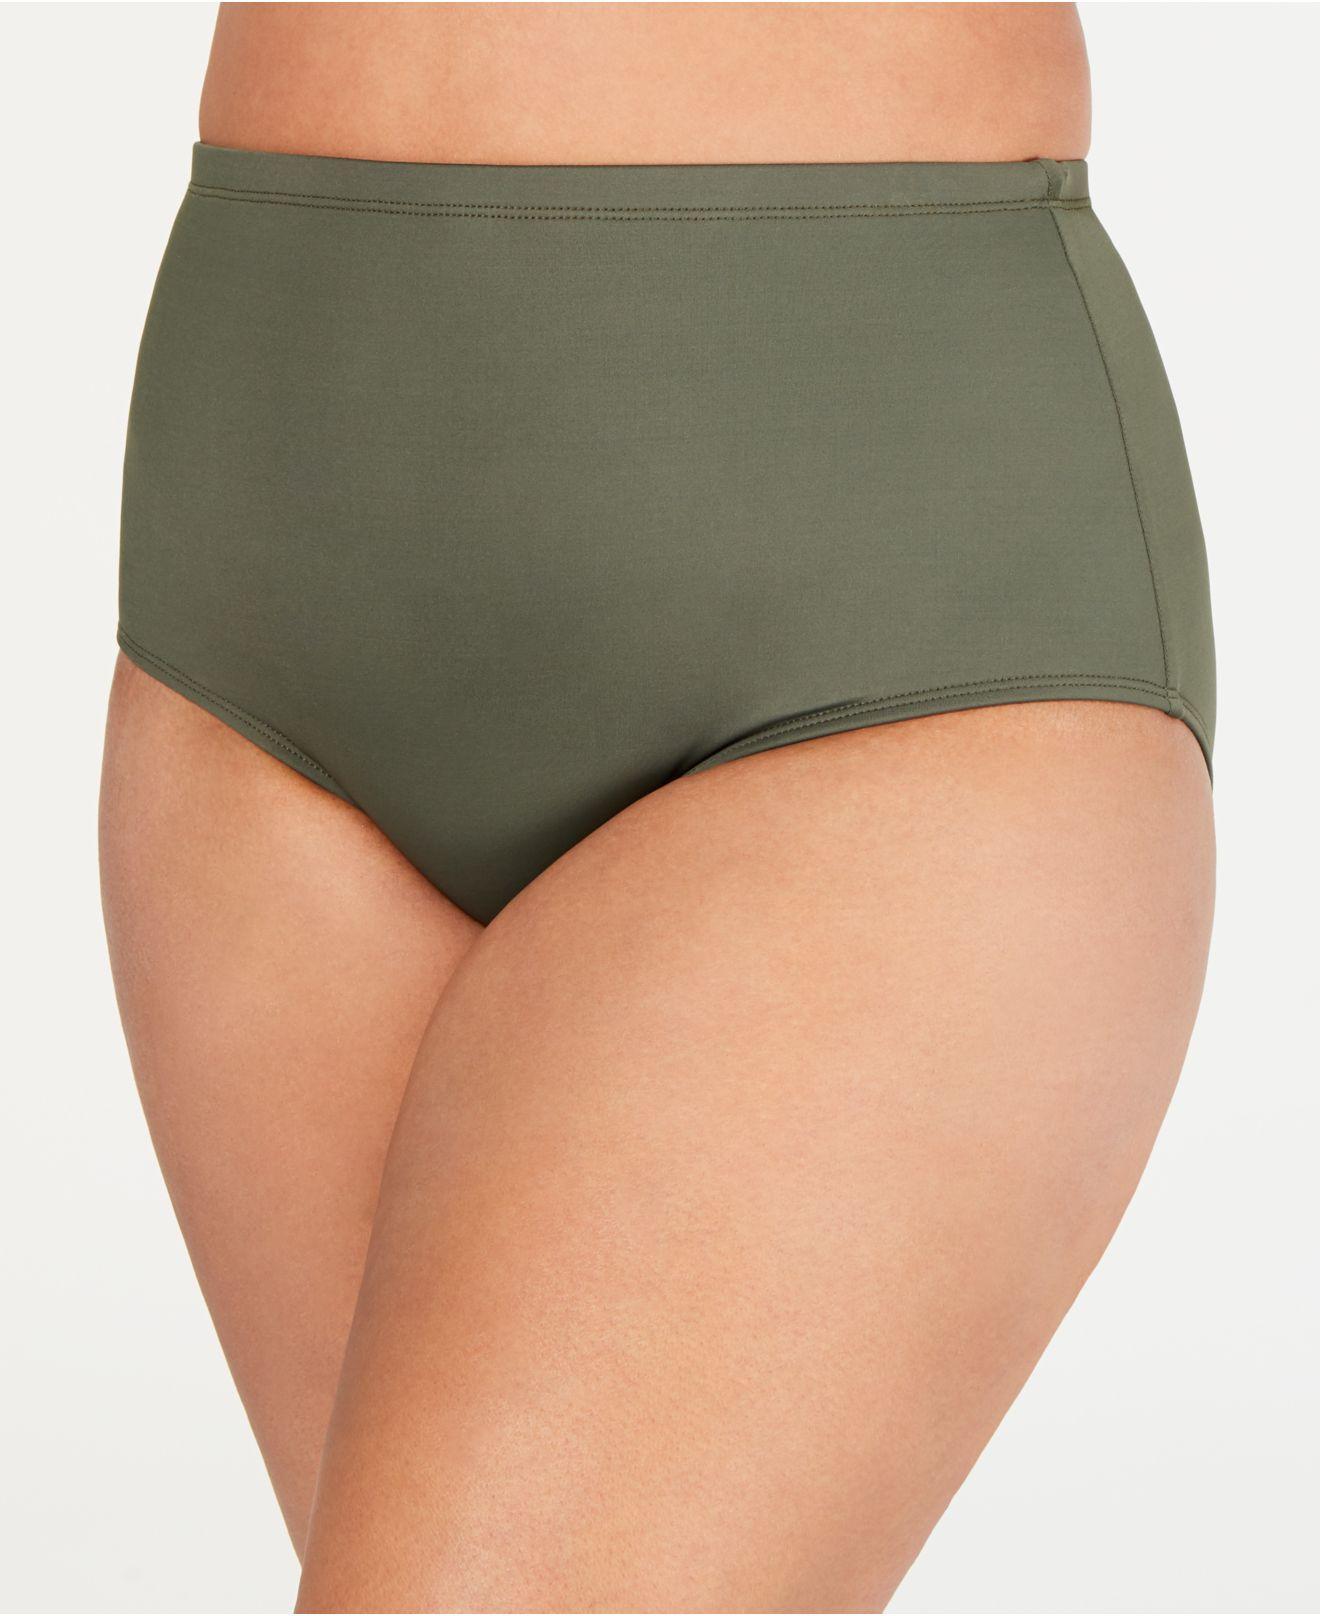 ad44c51025689 Lyst - La Blanca Plus Size High-waist Swim Bottoms in Green